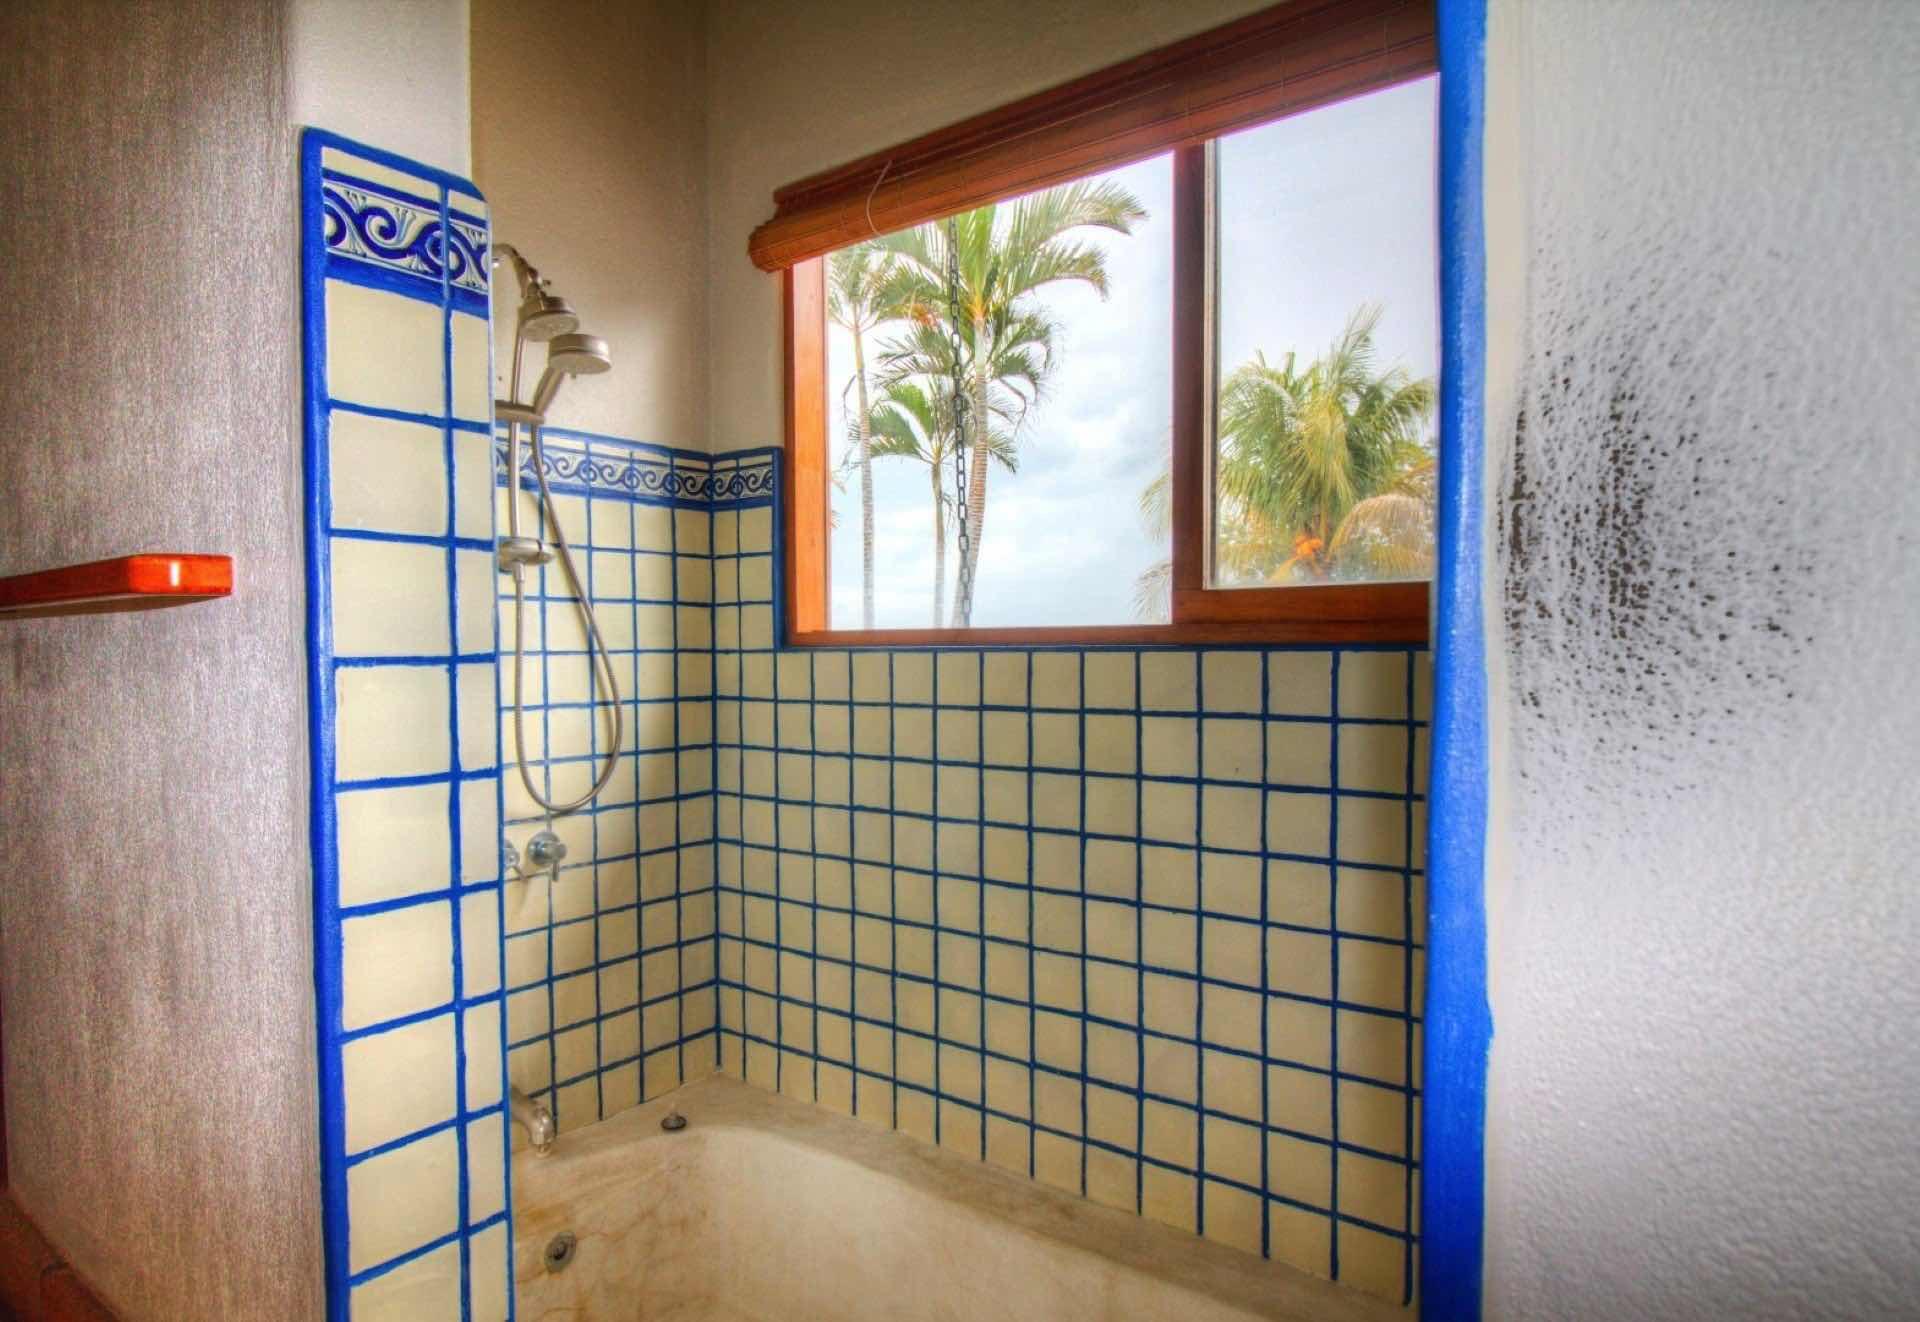 Bathroom with showerheads